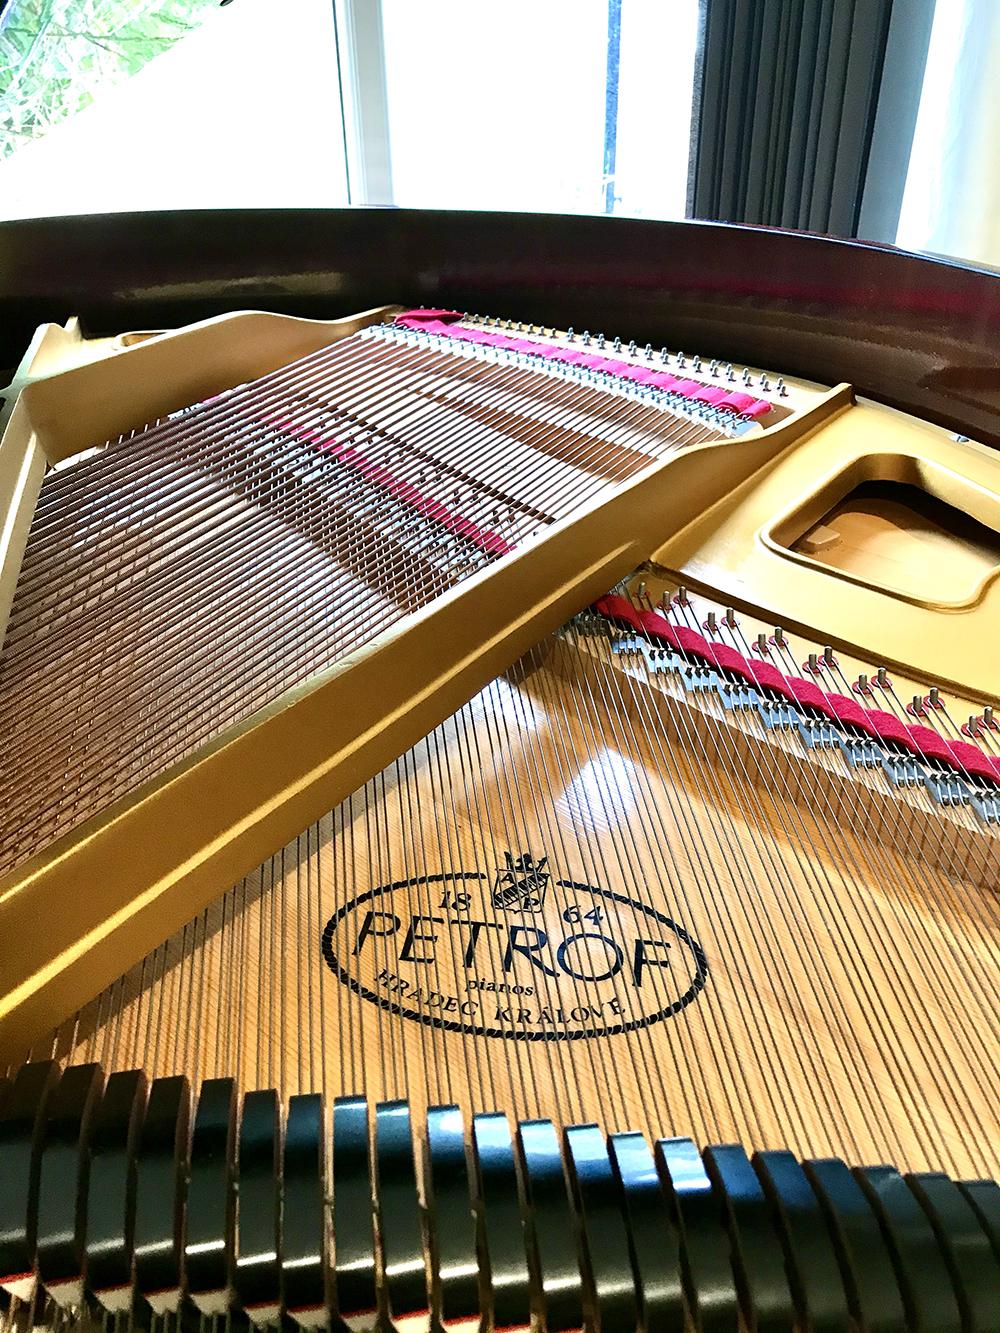 used-petrof-baby-grand-Piano-Dorset-for-sale-1.jpg